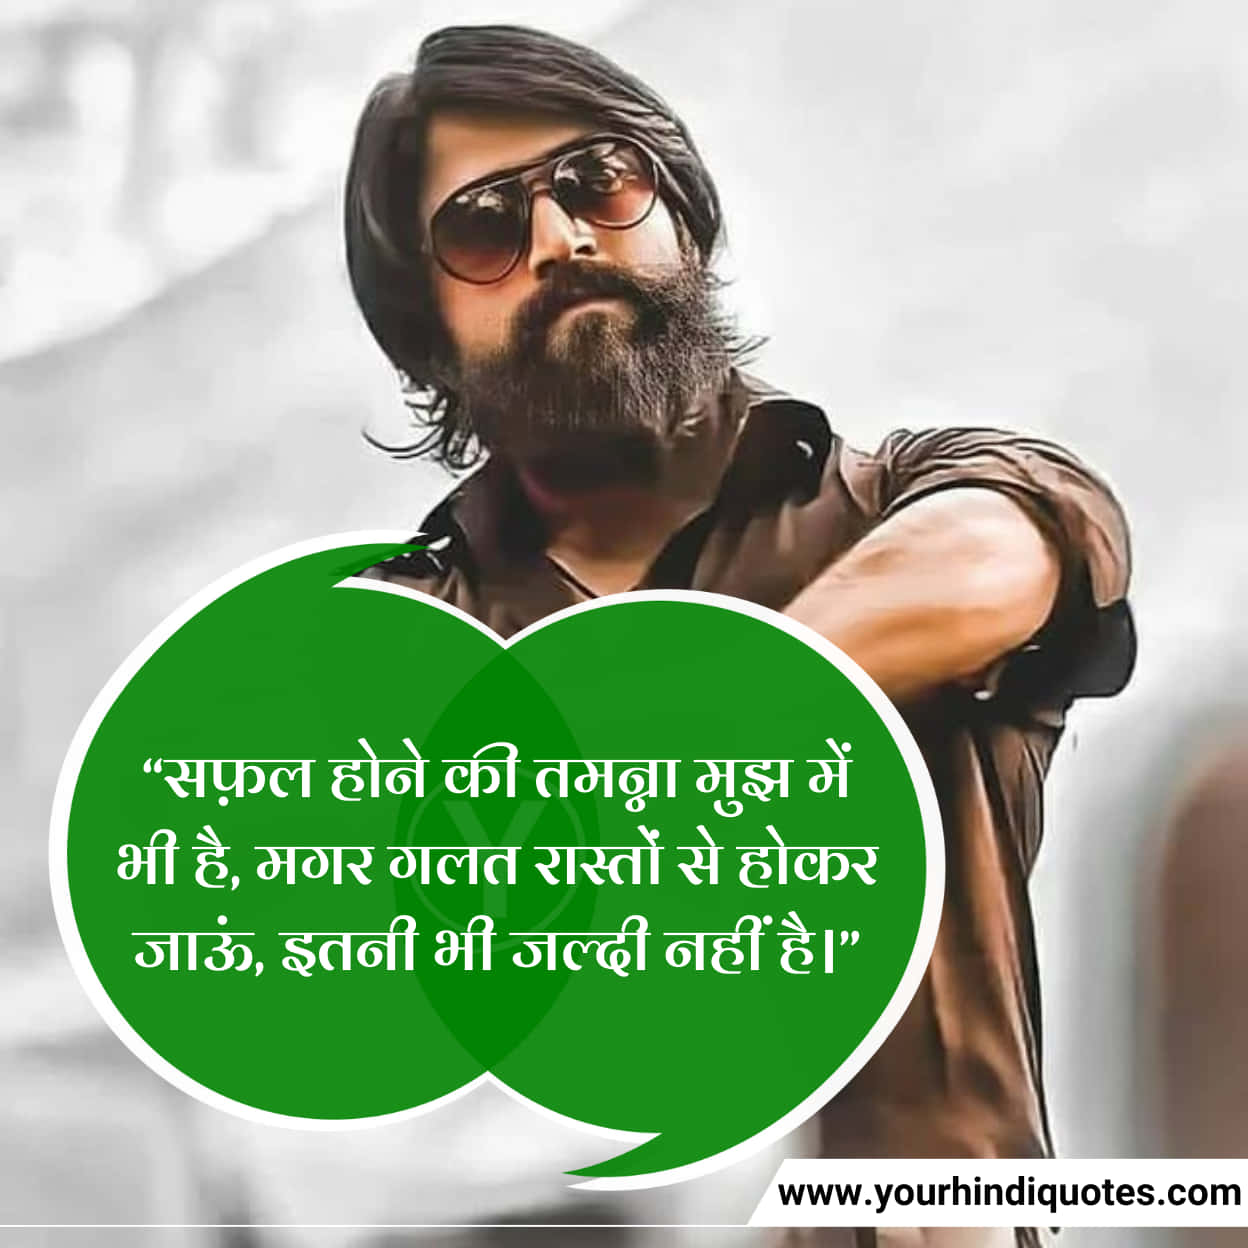 Best Emotional QuotesIn Hindi